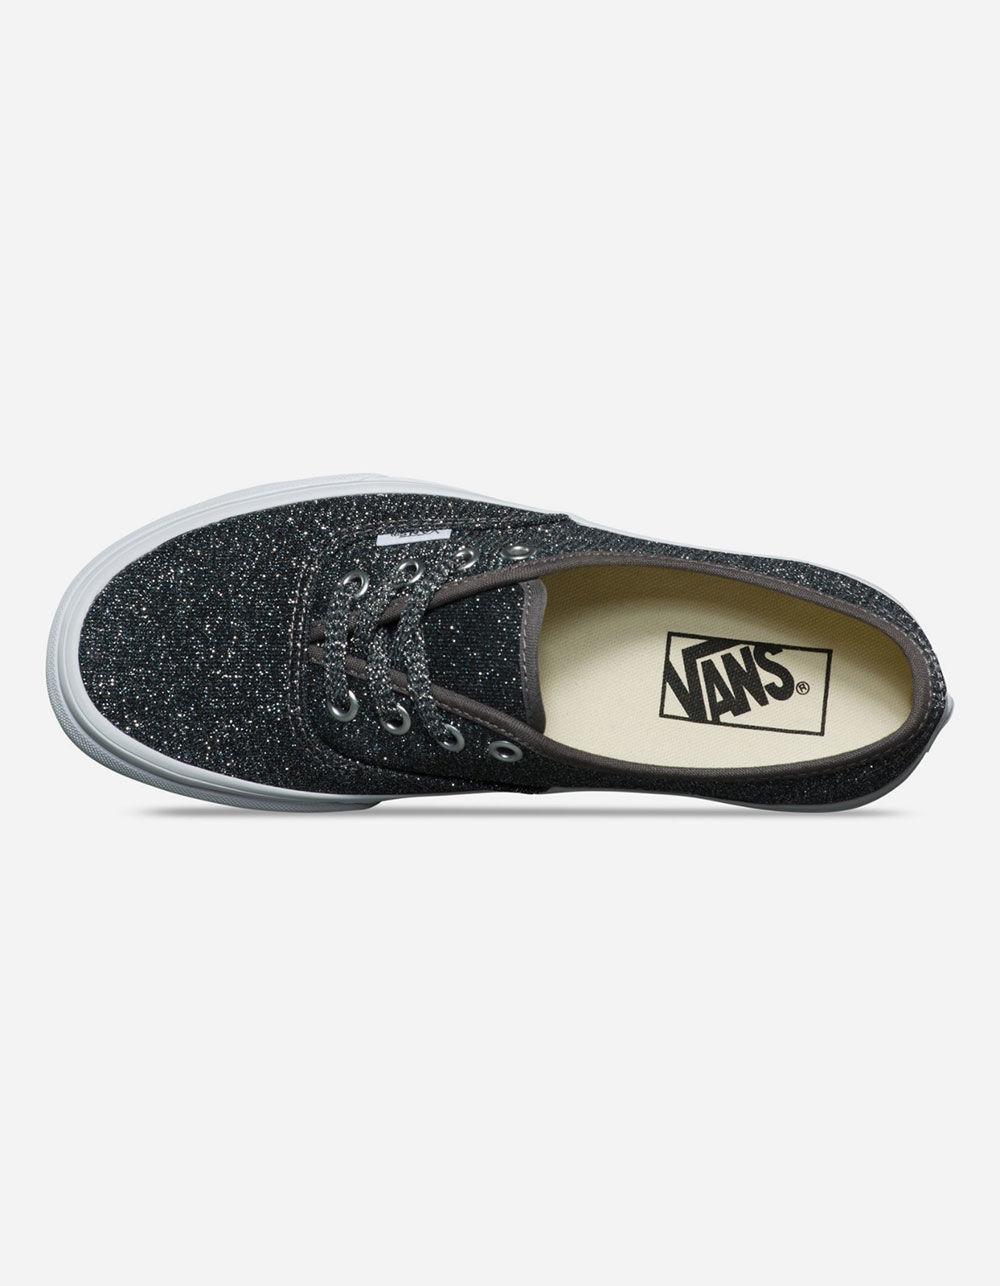 24081c4a811dc1 Vans - Lurex Glitter Authentic Black   True White Womens Shoes - Lyst. View  fullscreen